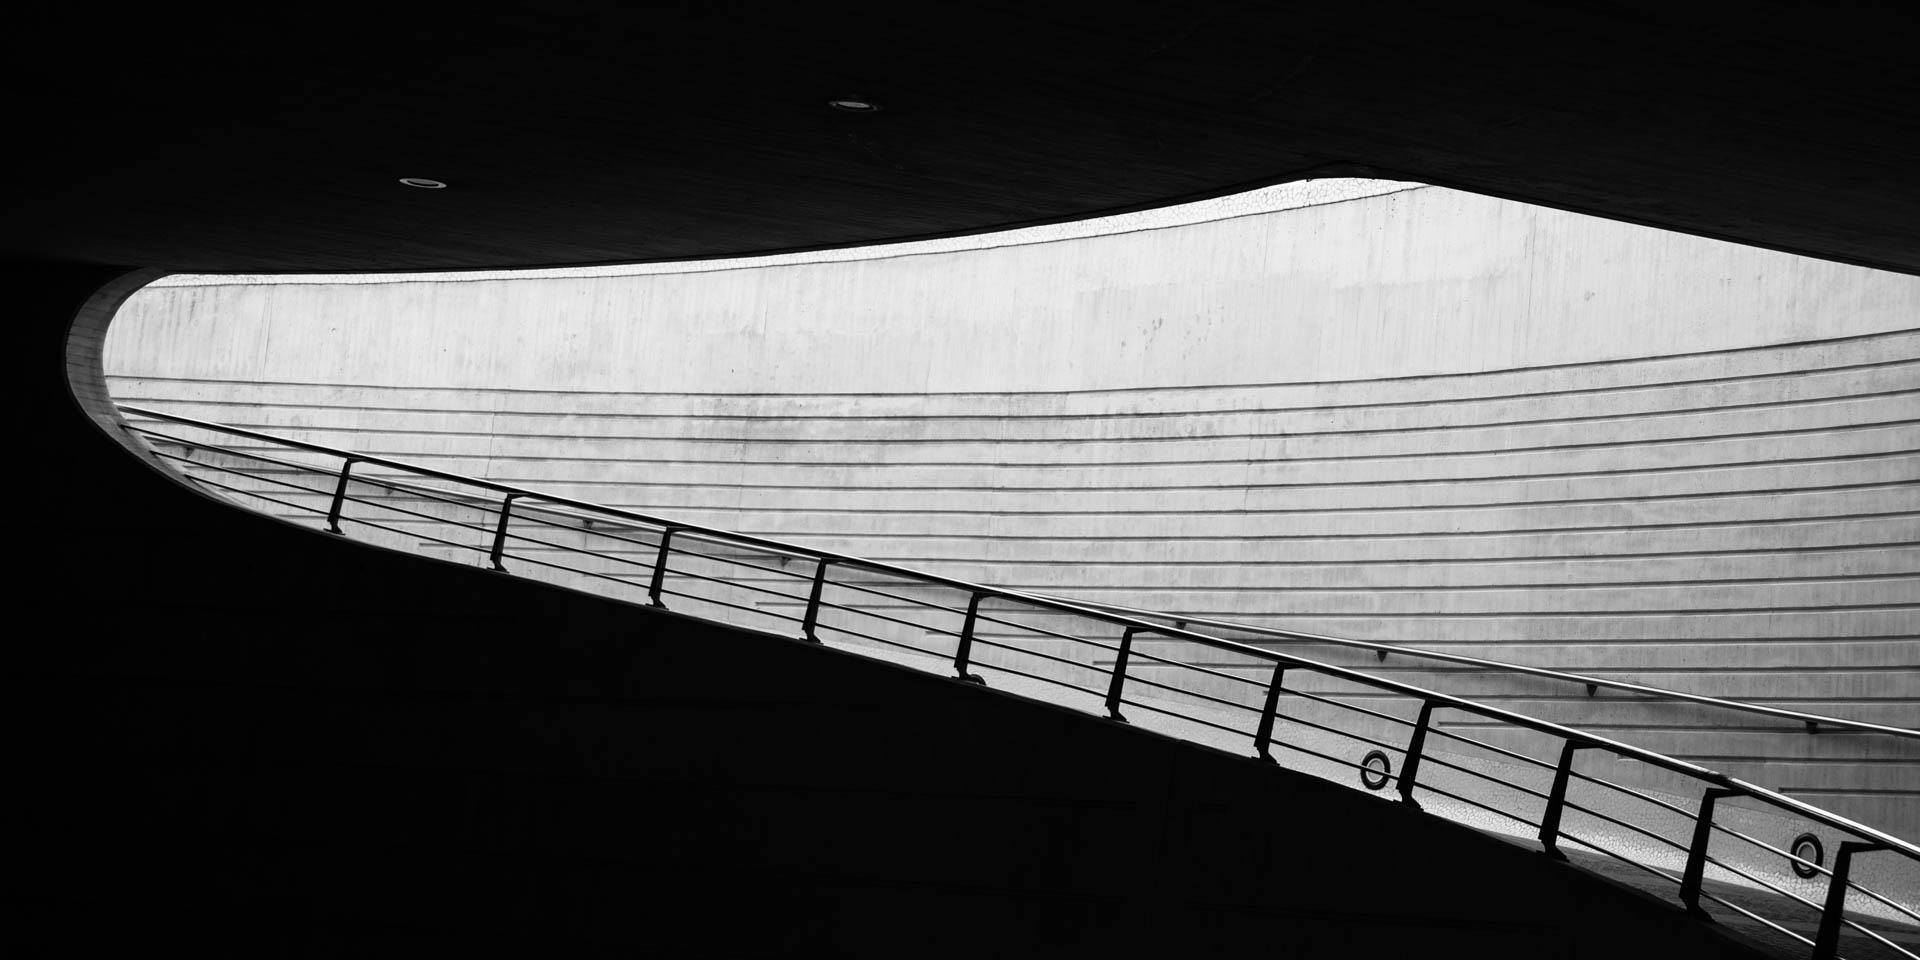 NOHO-Valencia-2009-34-V3.jpg